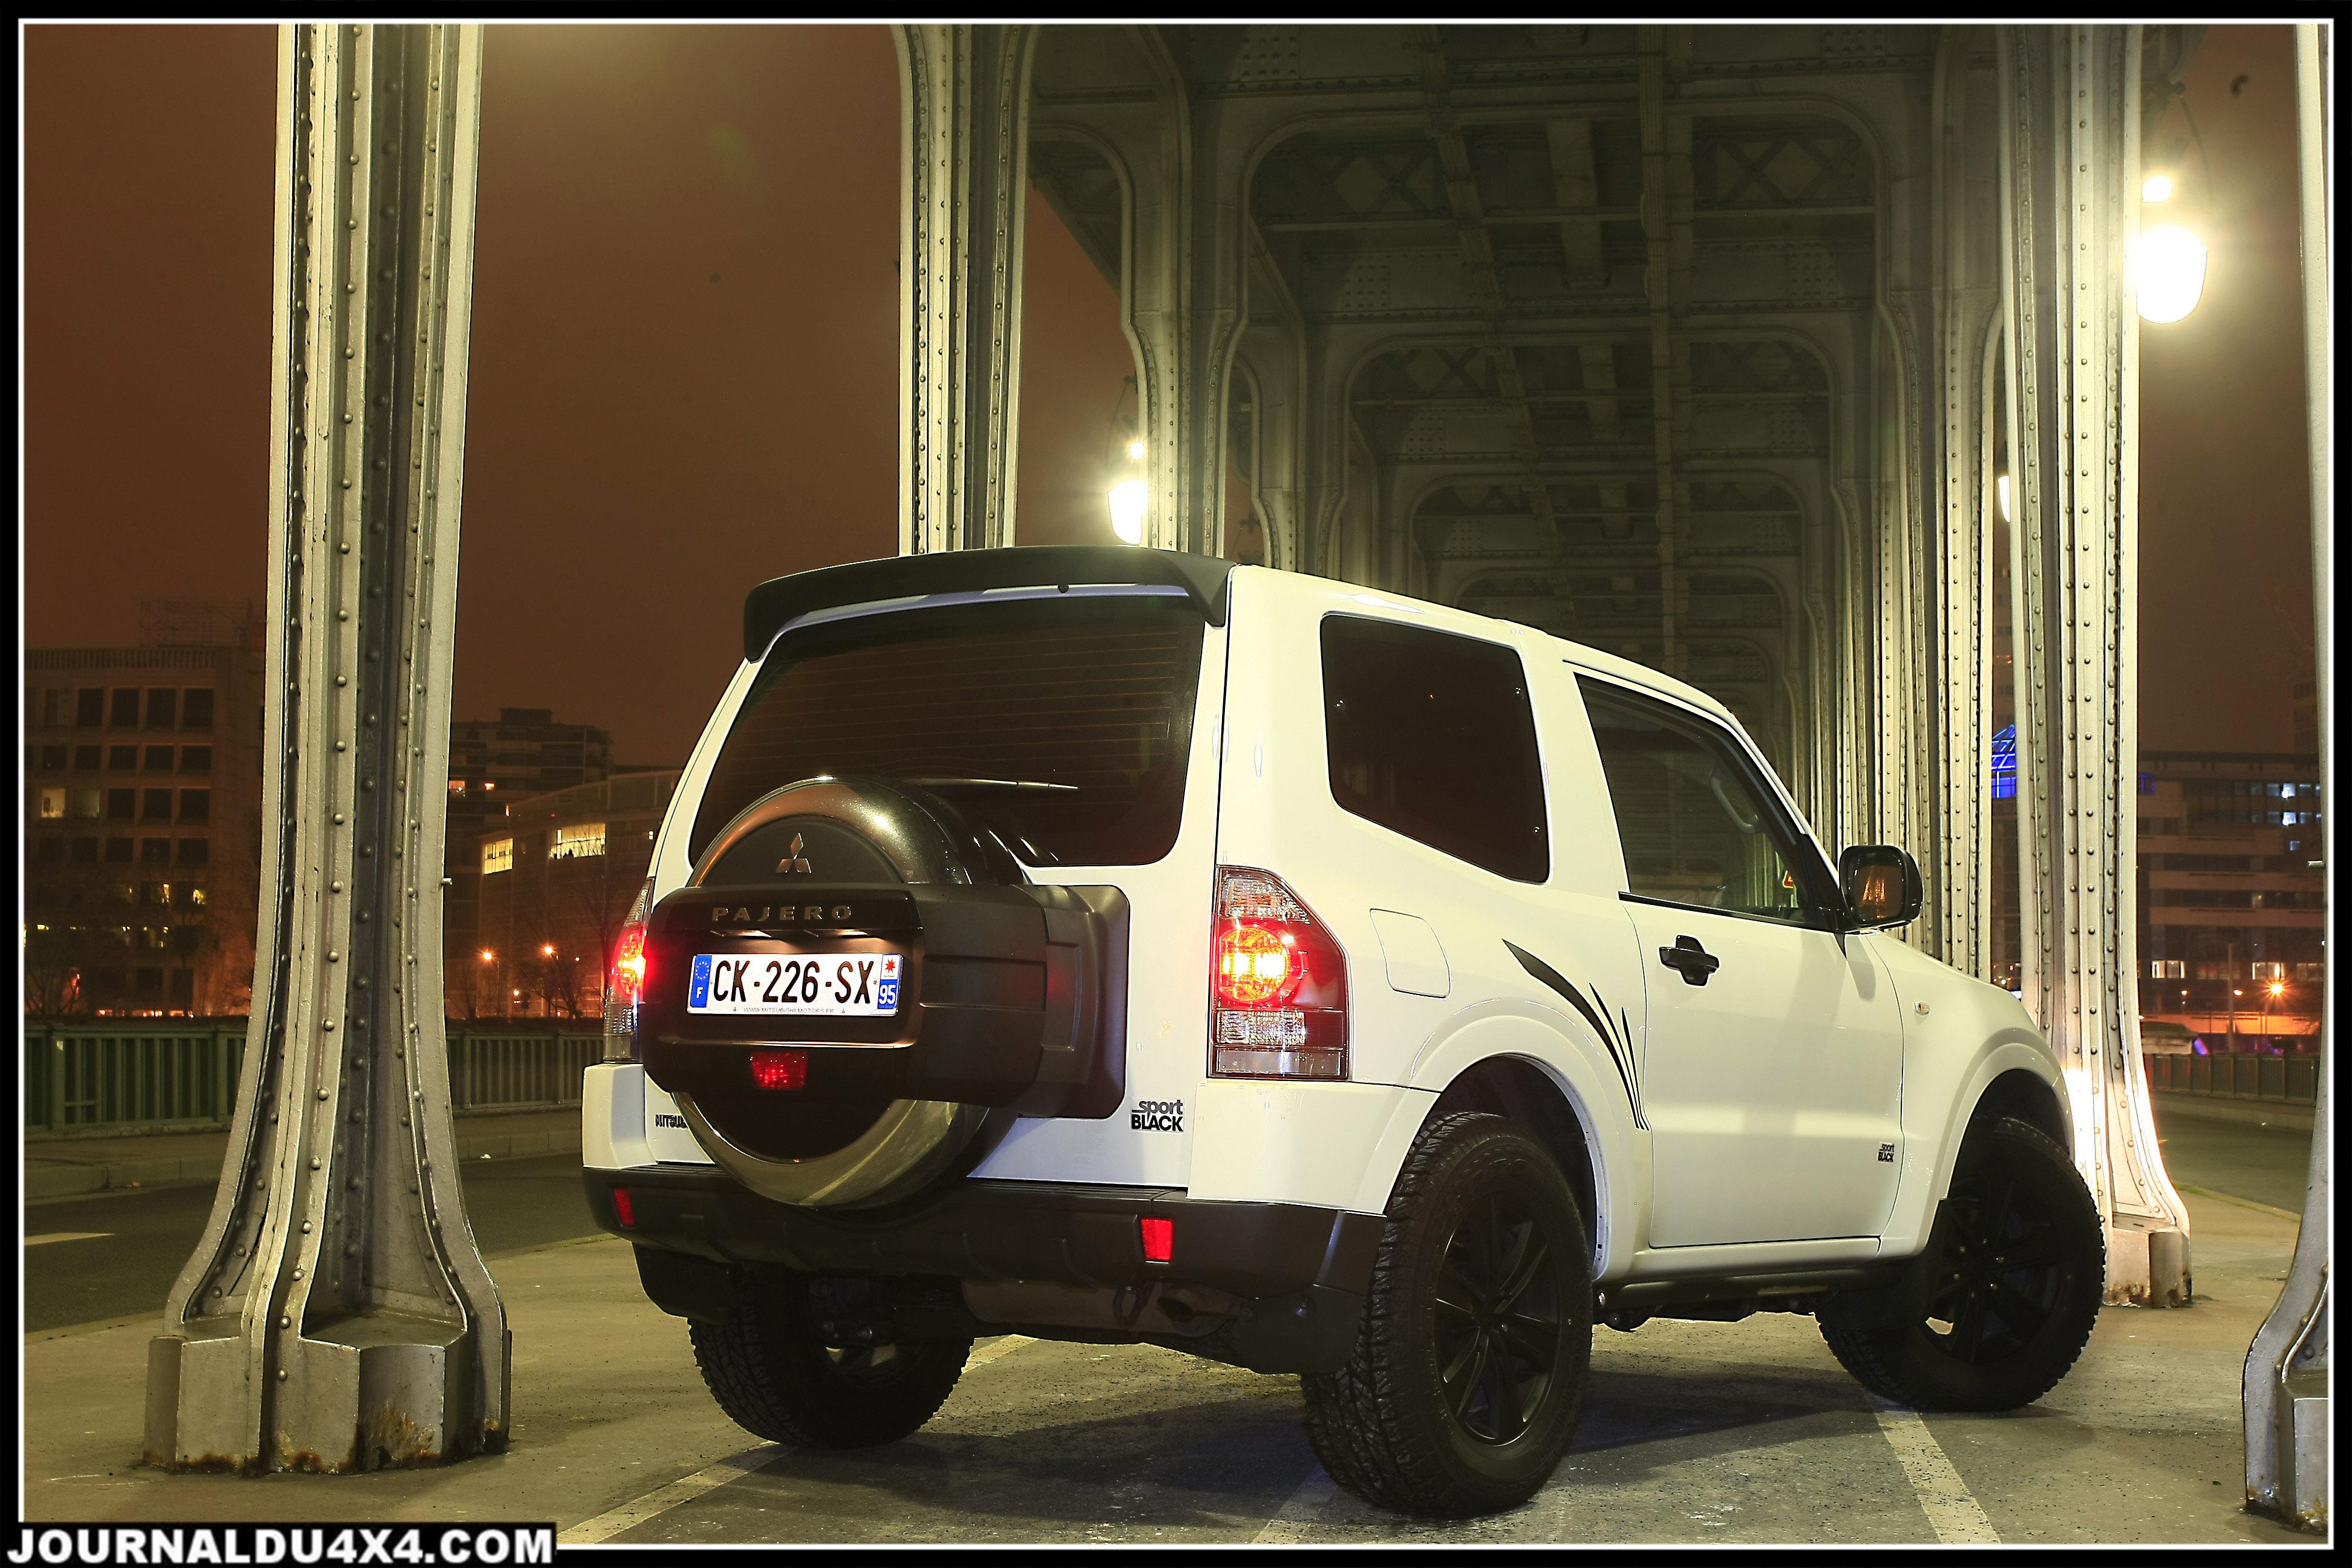 Mitsubishi_Pajero_sport-black.jpg